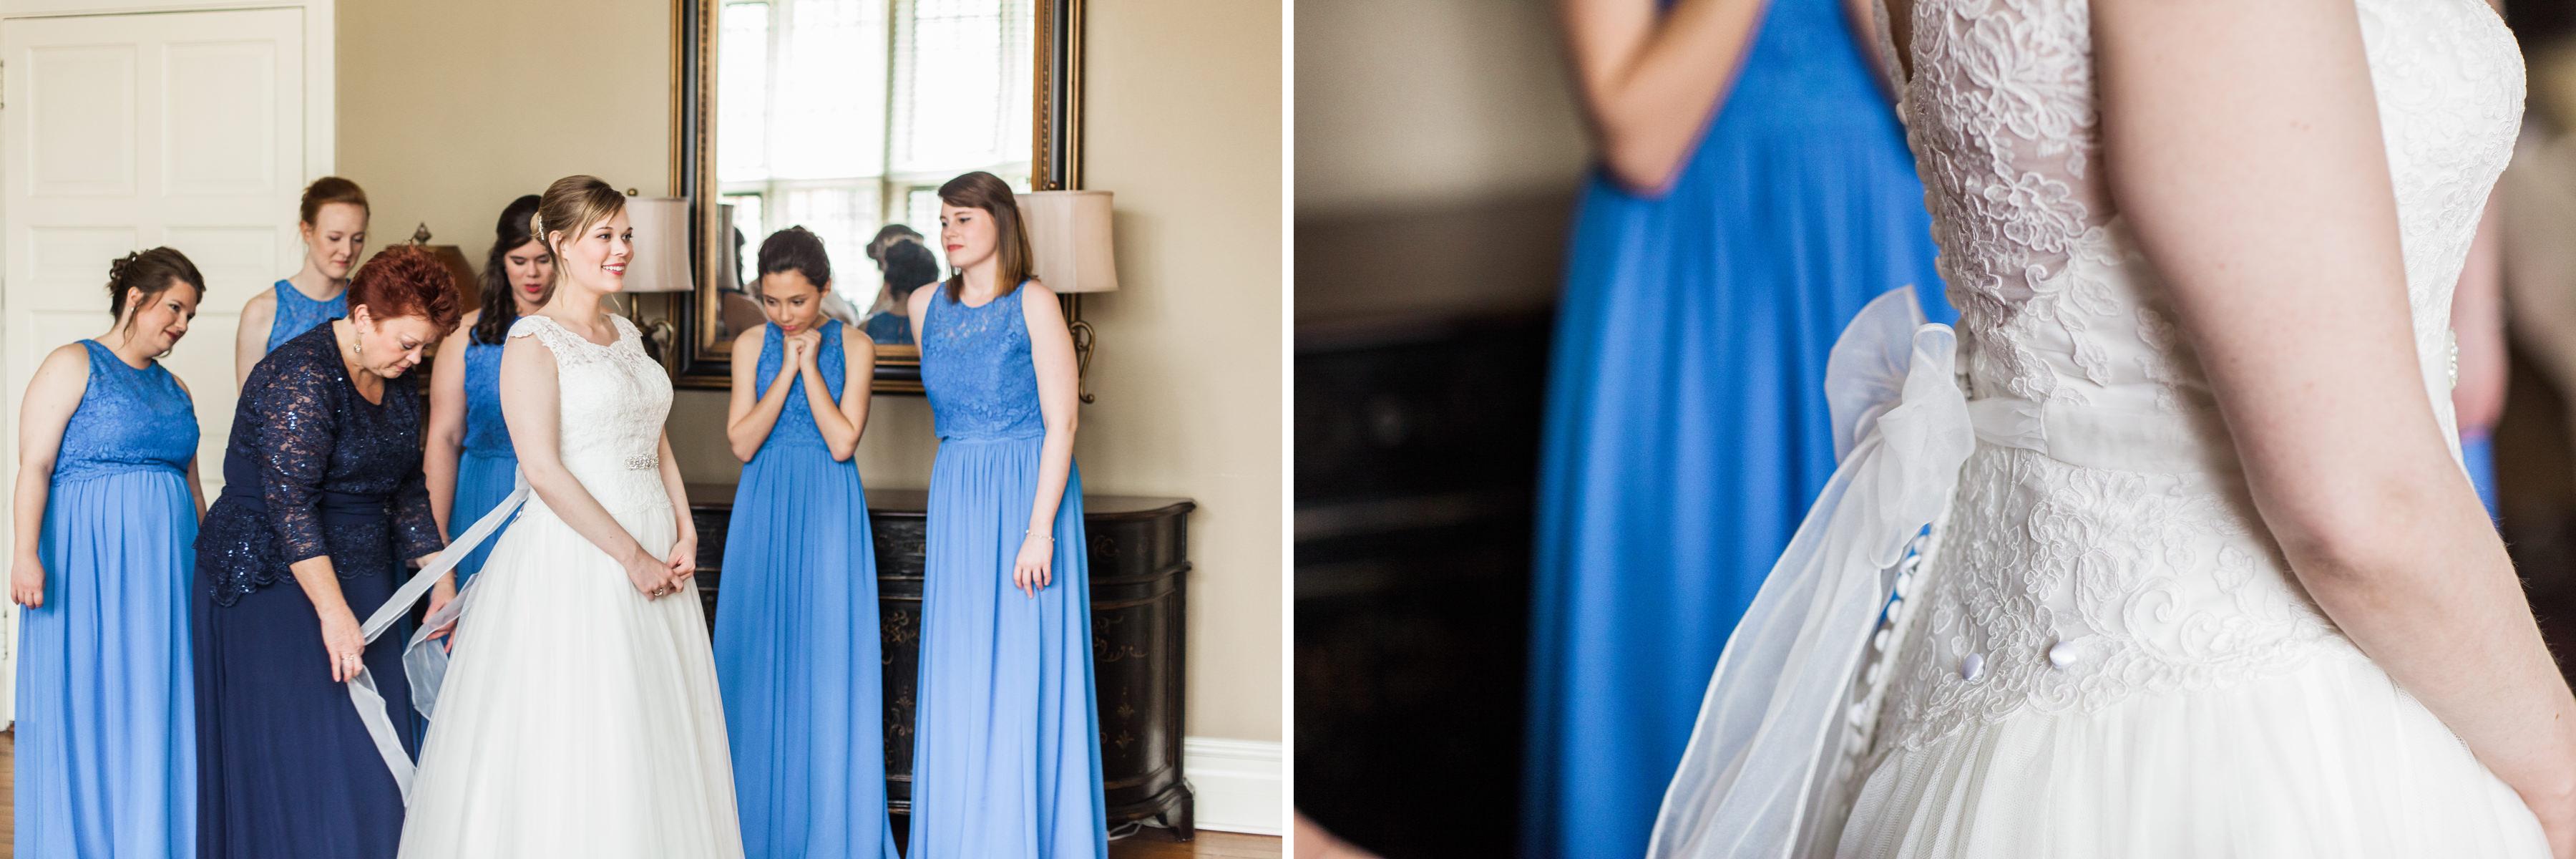 MAULDIN_WEDDING_MONTGOMERY_ALABAMA_WEDDING_PHOTOGRAPHY_20